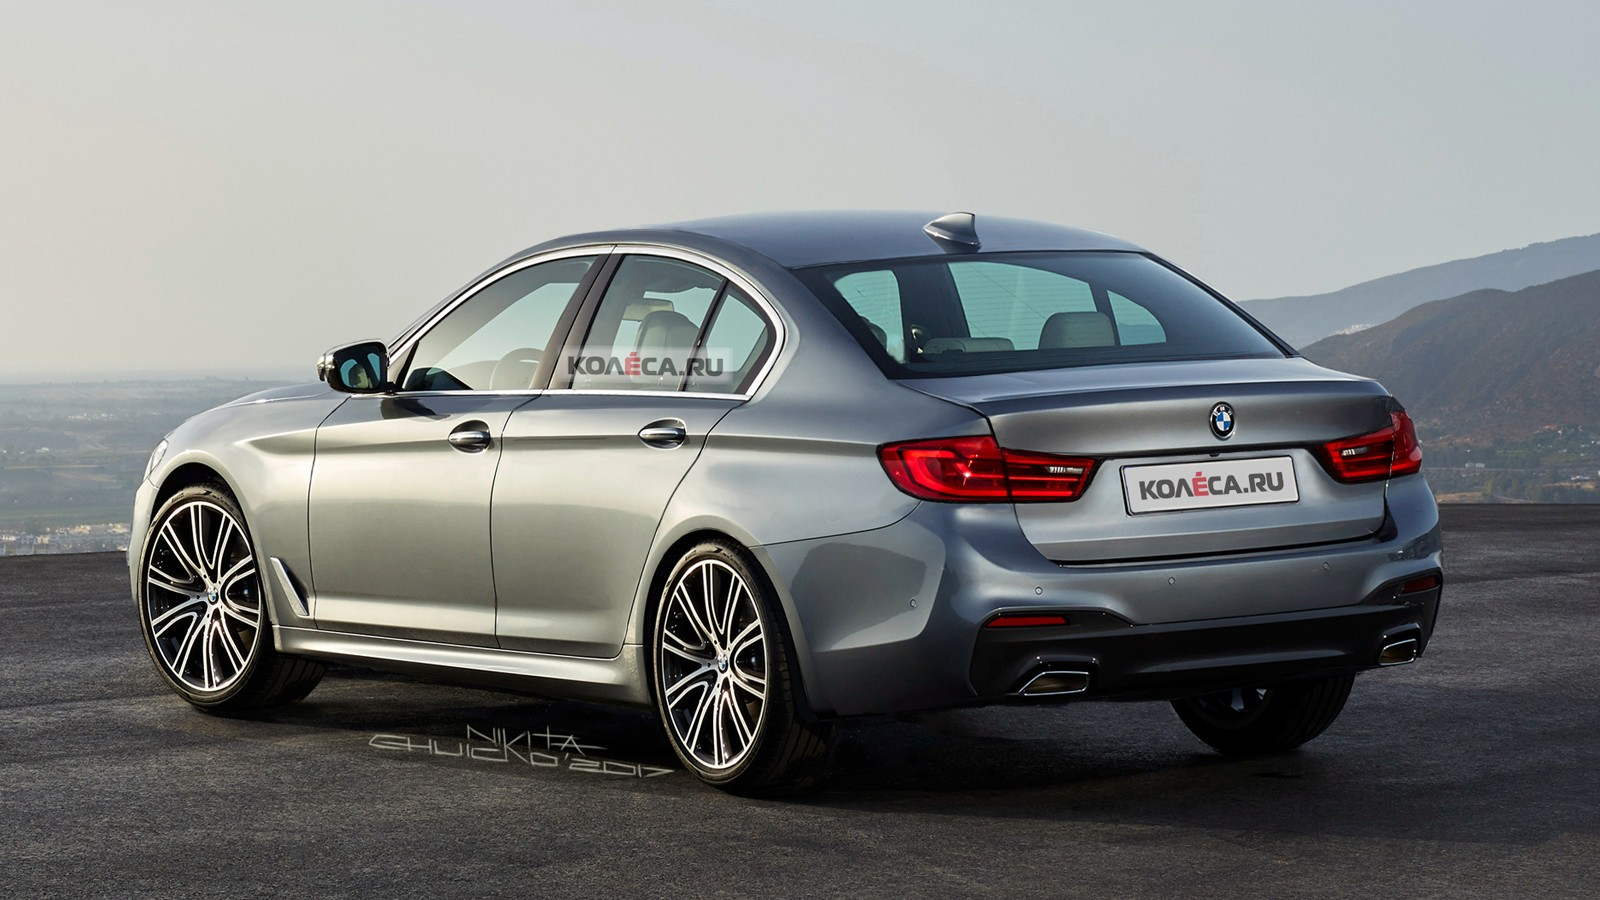 На фото: BMW 3 Series G20 в интерпретации художника портала Колёса.ру